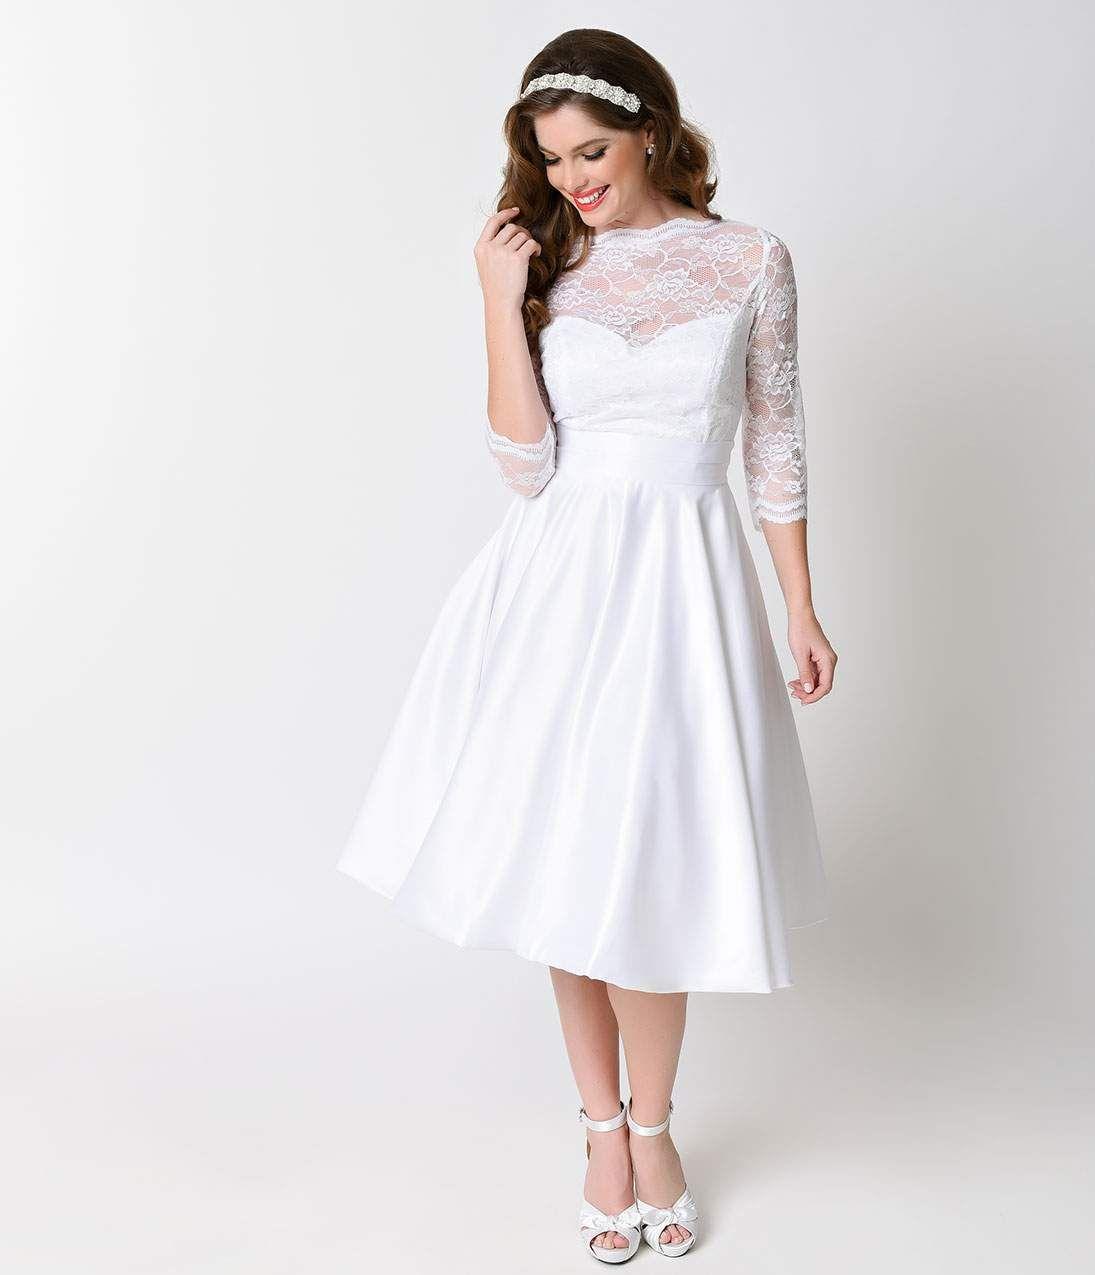 Vintage Style Wedding Dresses Vintage Inspired Wedding Gowns 1960s Style Wedding Dresses 1950s Style Wedding Dresses Vintage Inspired Wedding Gown [ 1275 x 1095 Pixel ]